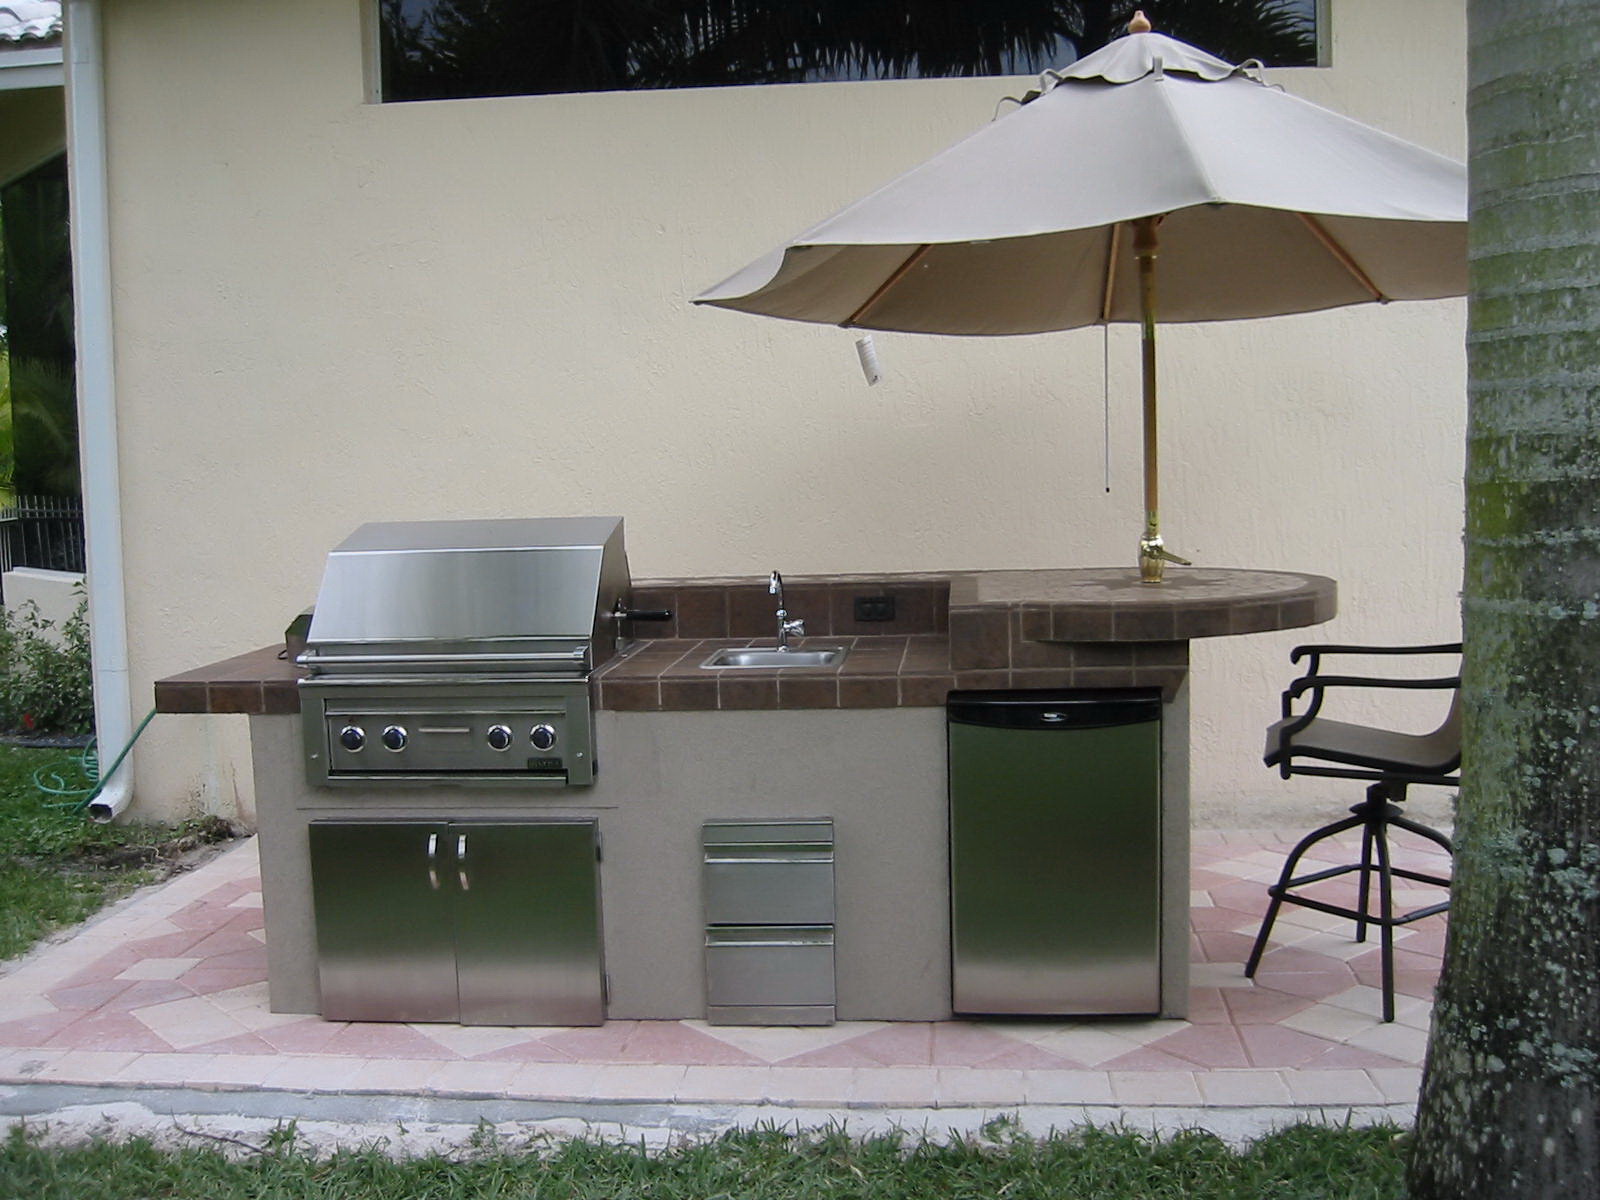 Outdoor Kitchen Design Images  GRILLREPAIRCOM barbeque